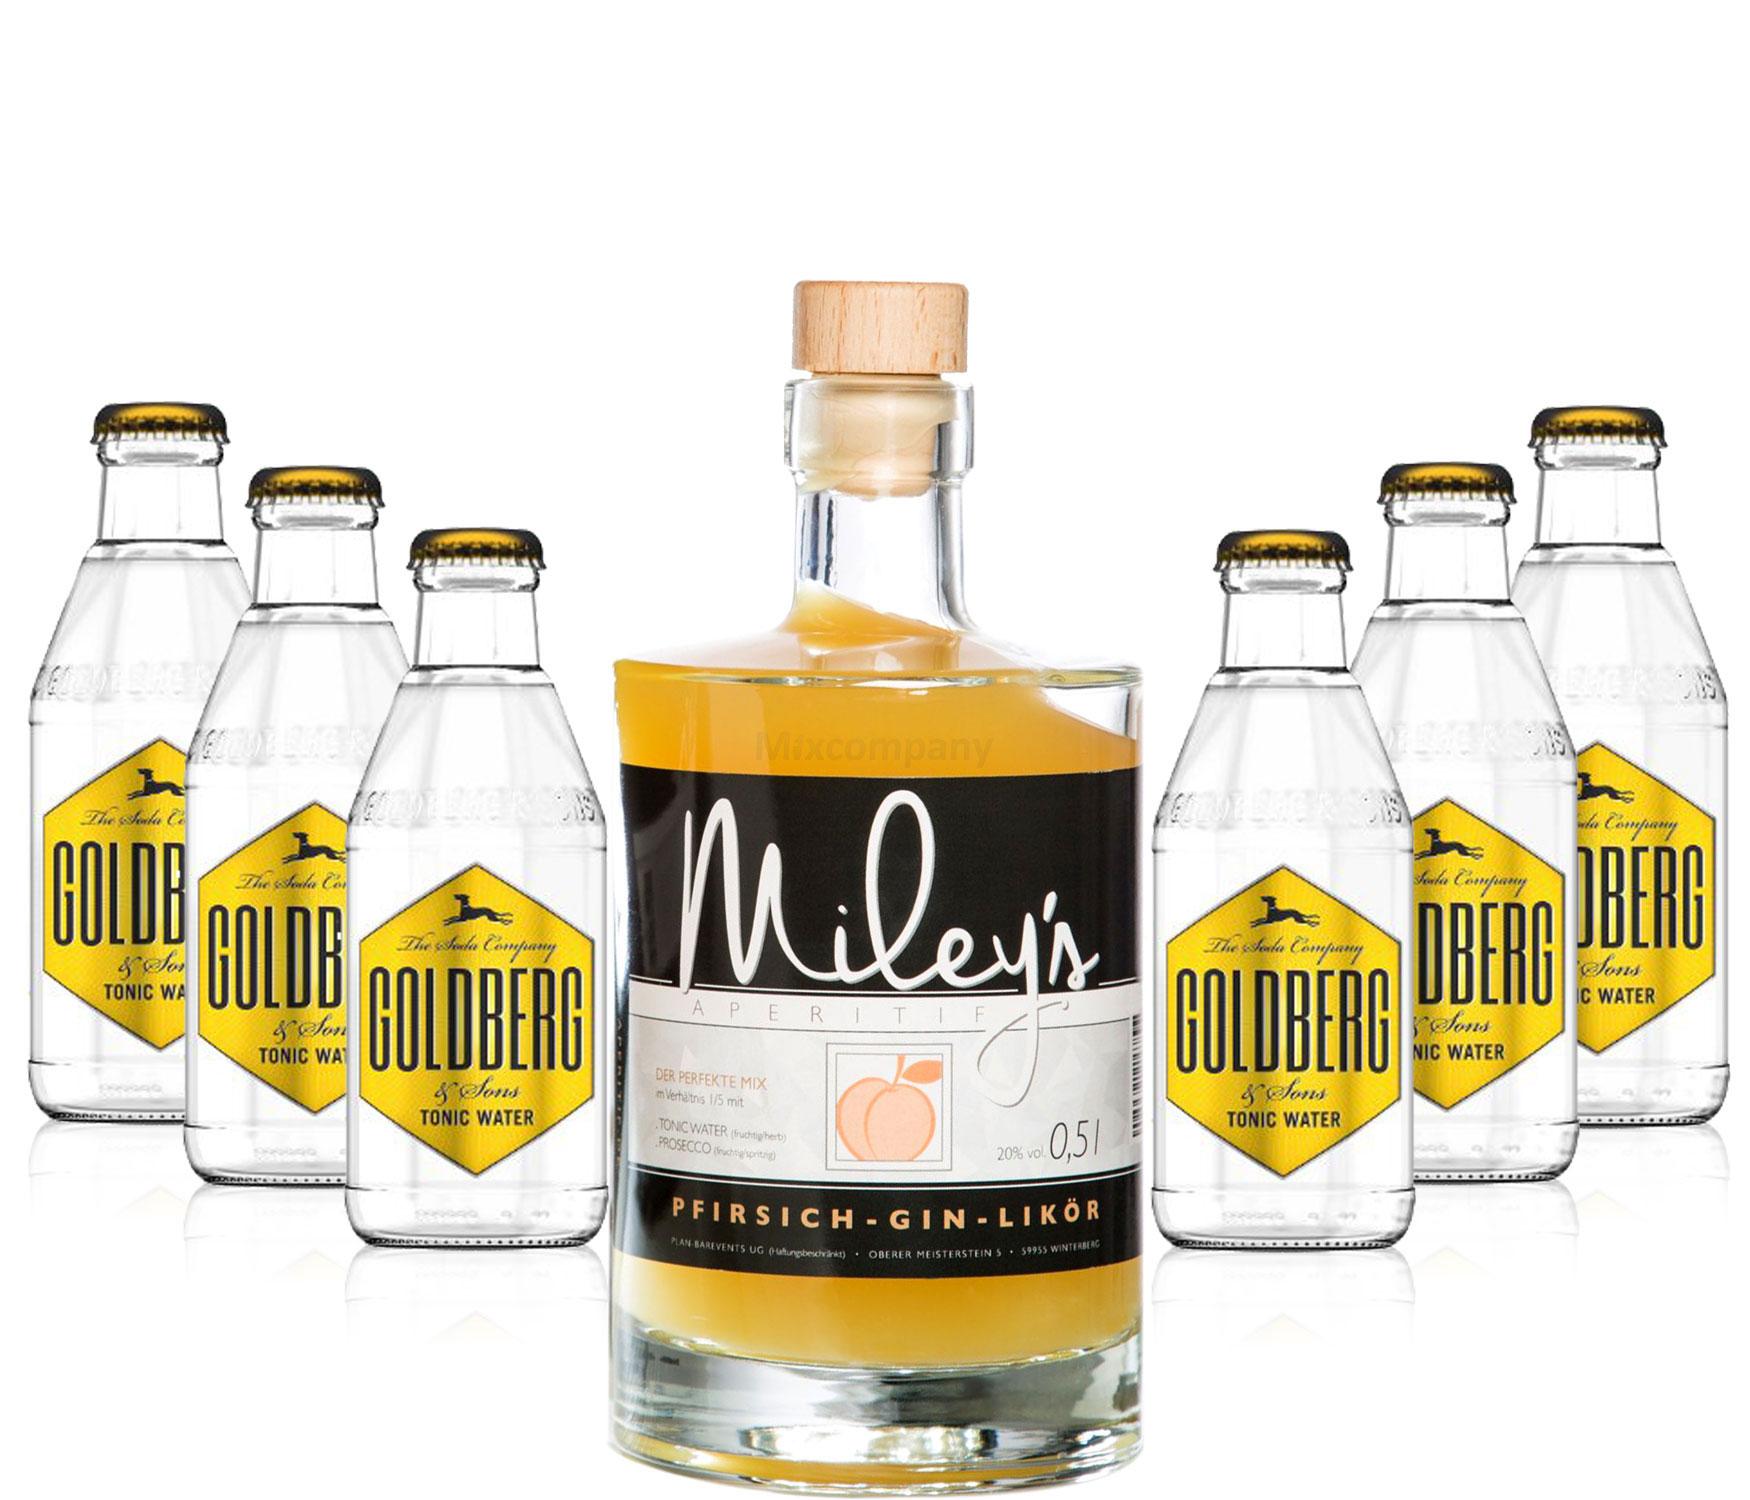 Mileys Pfirsich Gin Likör 0,5l (20% Vol) + 6x Goldberg Tonic Water 200ml inkl. Pfand MEHRWEG -[Enthält Sulfite]